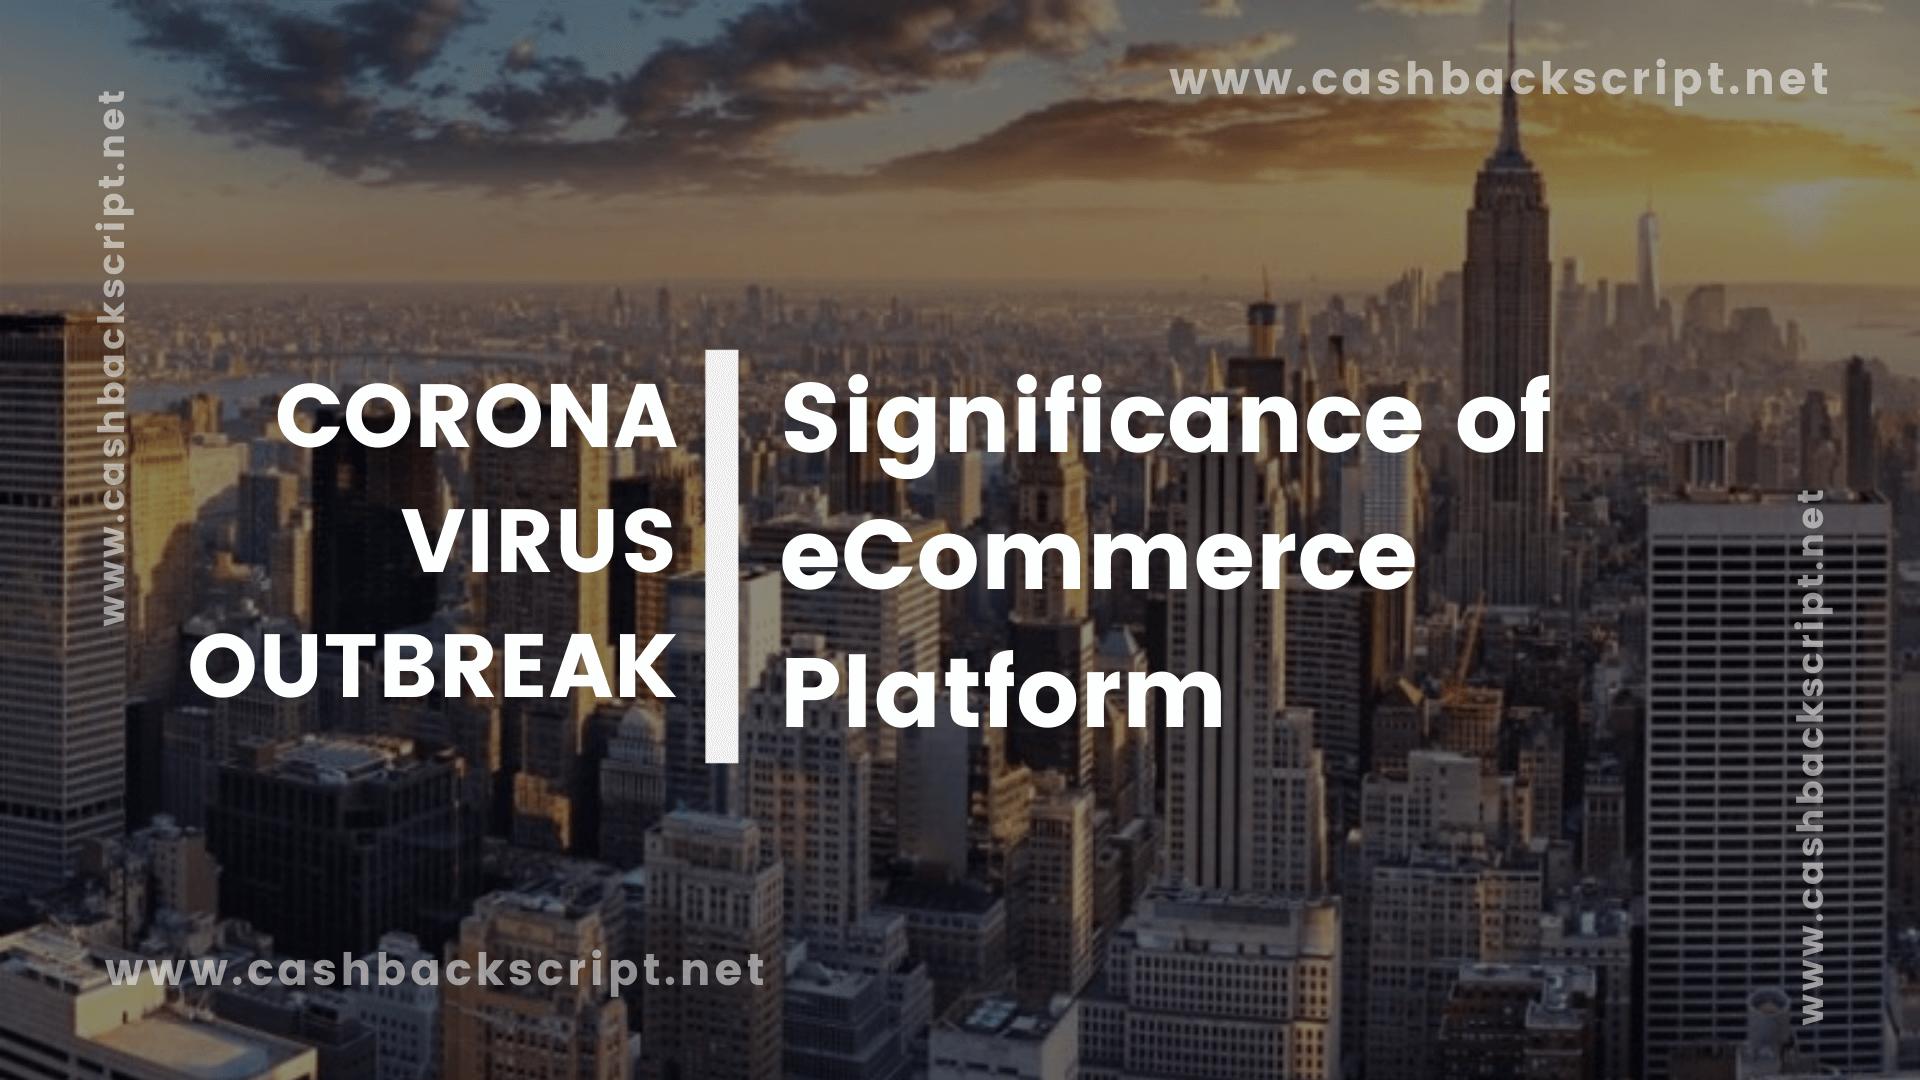 Corona Virus Outbreak - Significance of eCommerce Platform